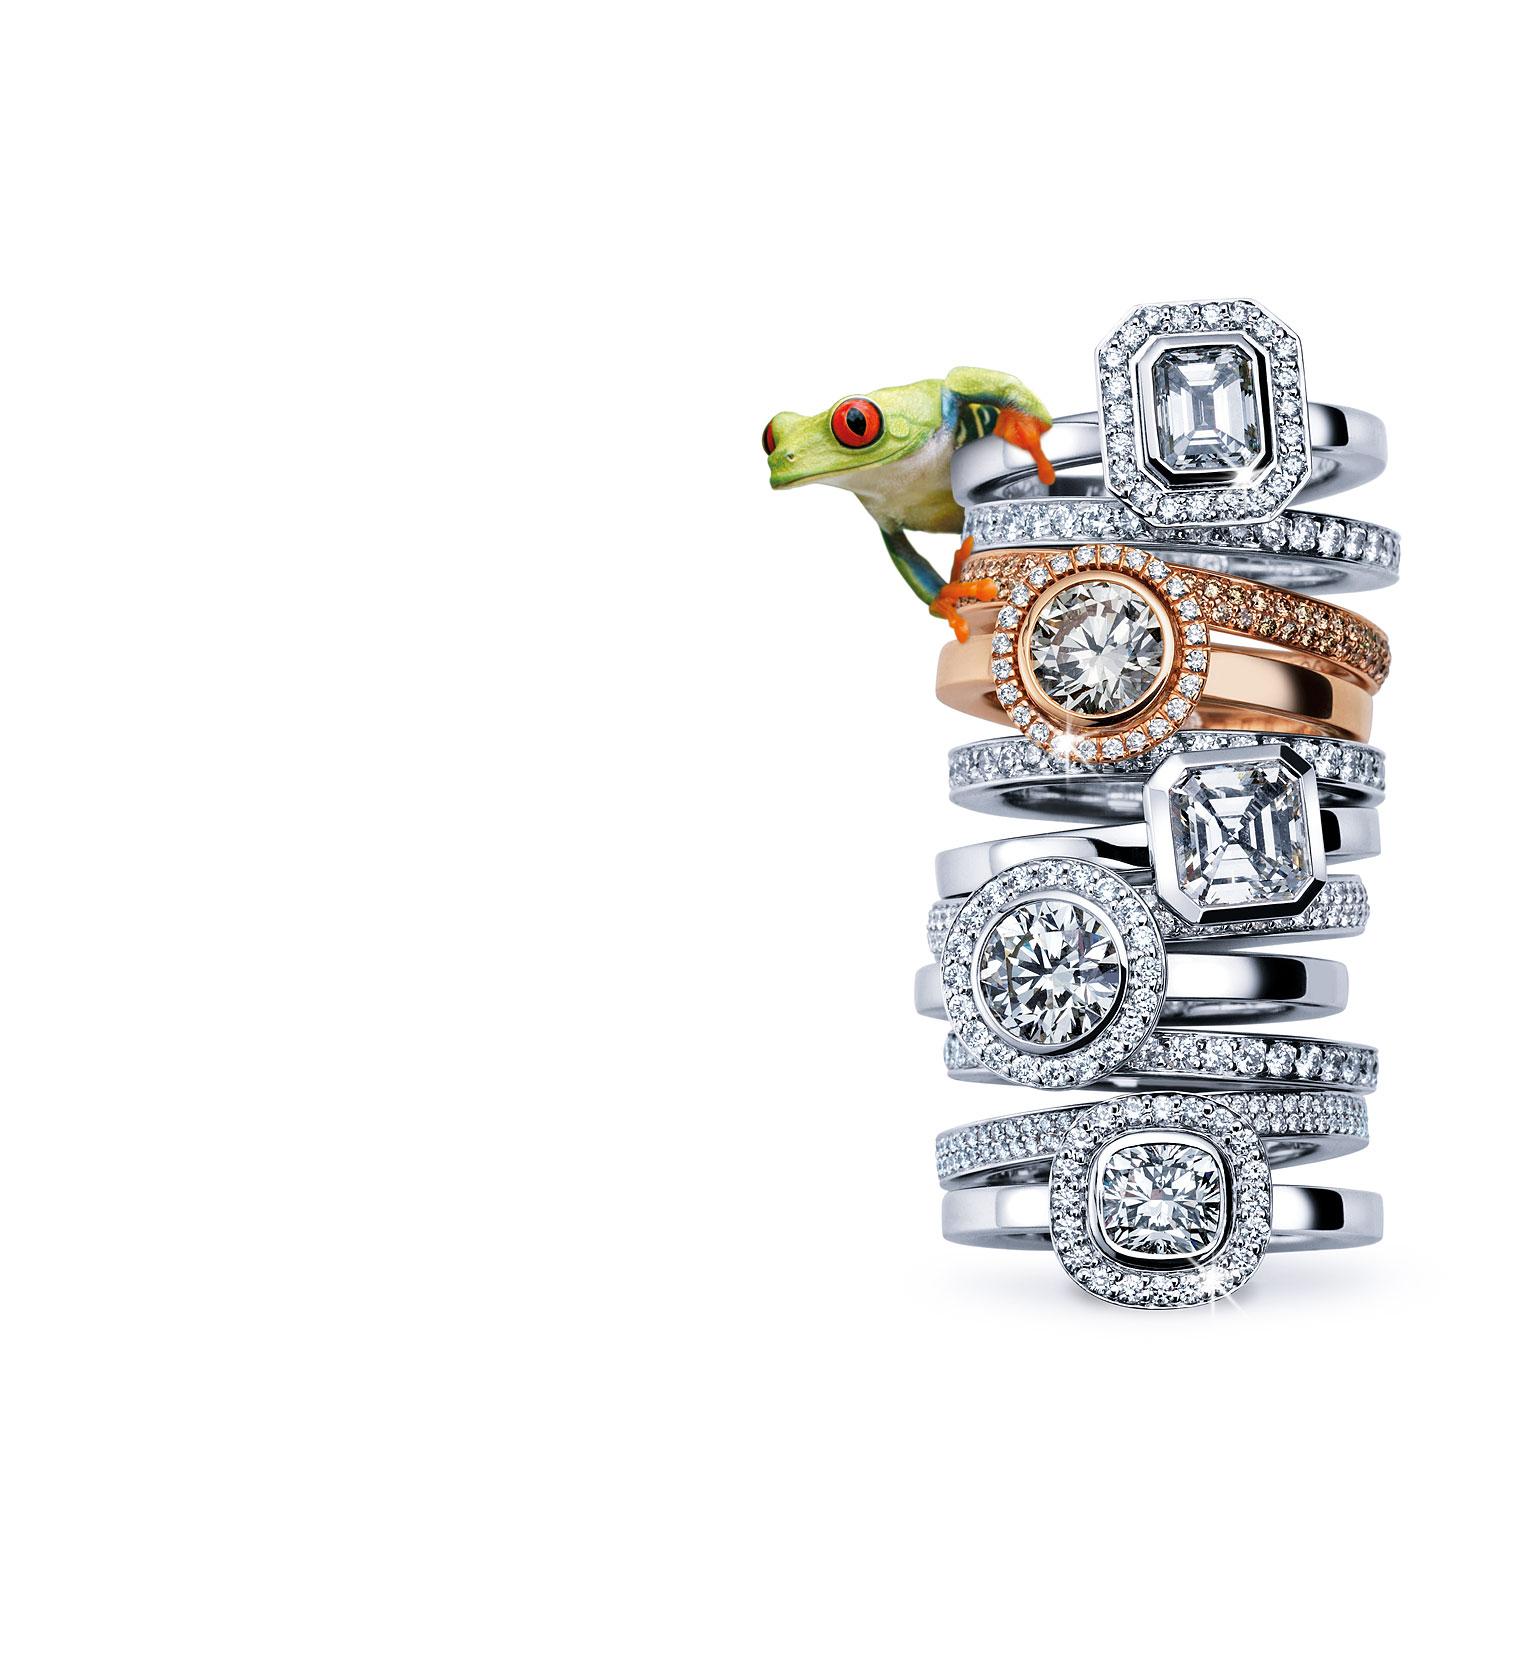 noor-by-wurster-diamonds_1538-x-1680px_Frosch